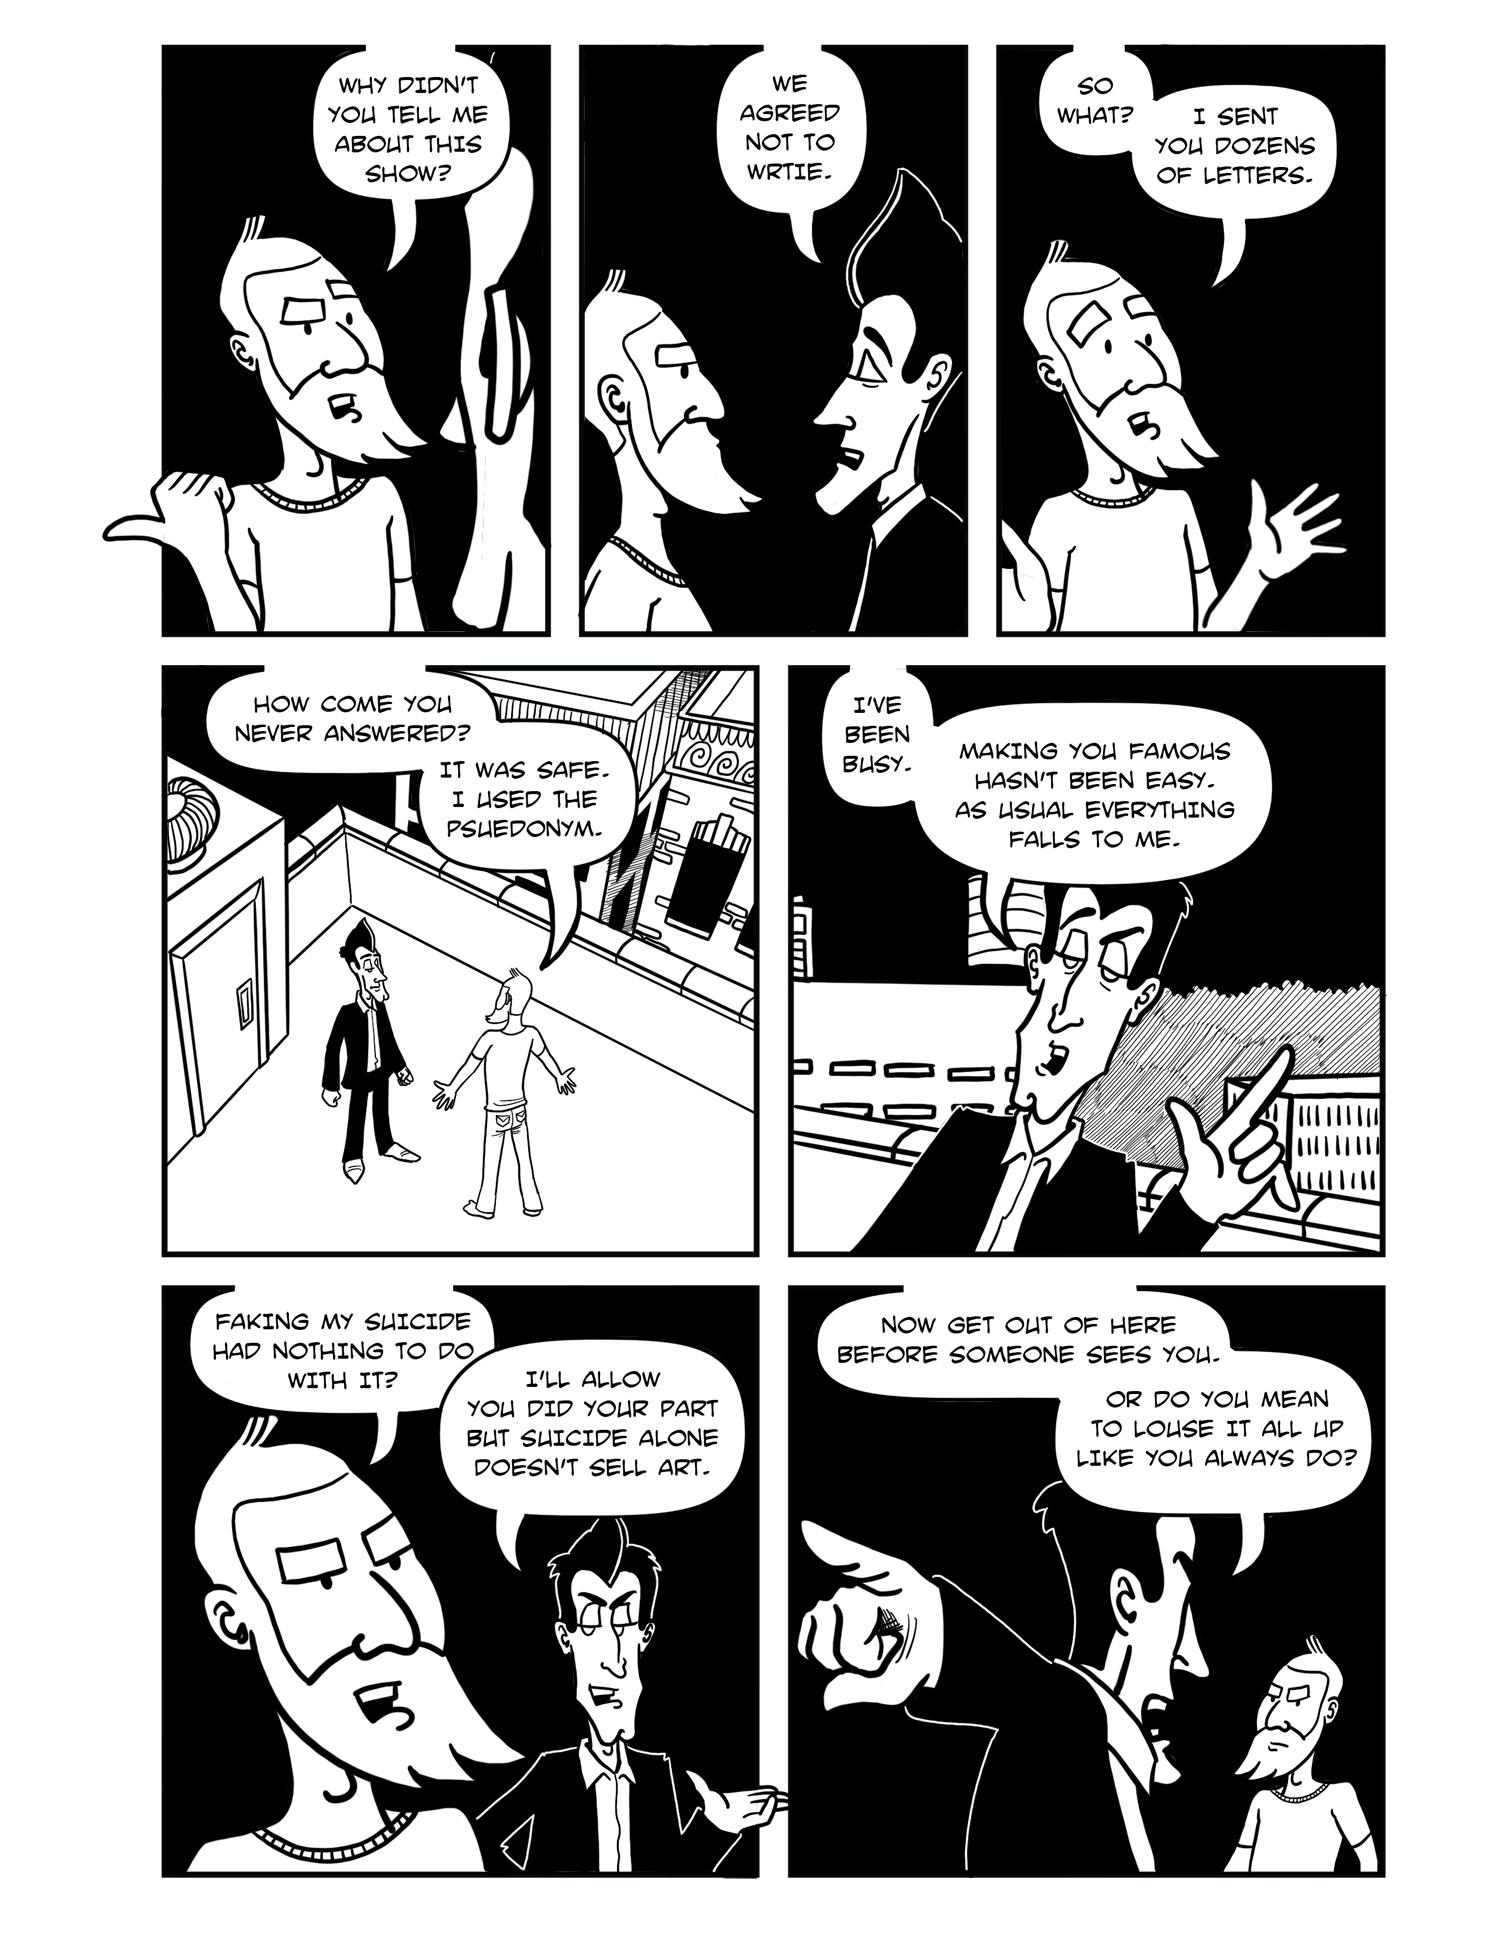 PAGE-207.jpg